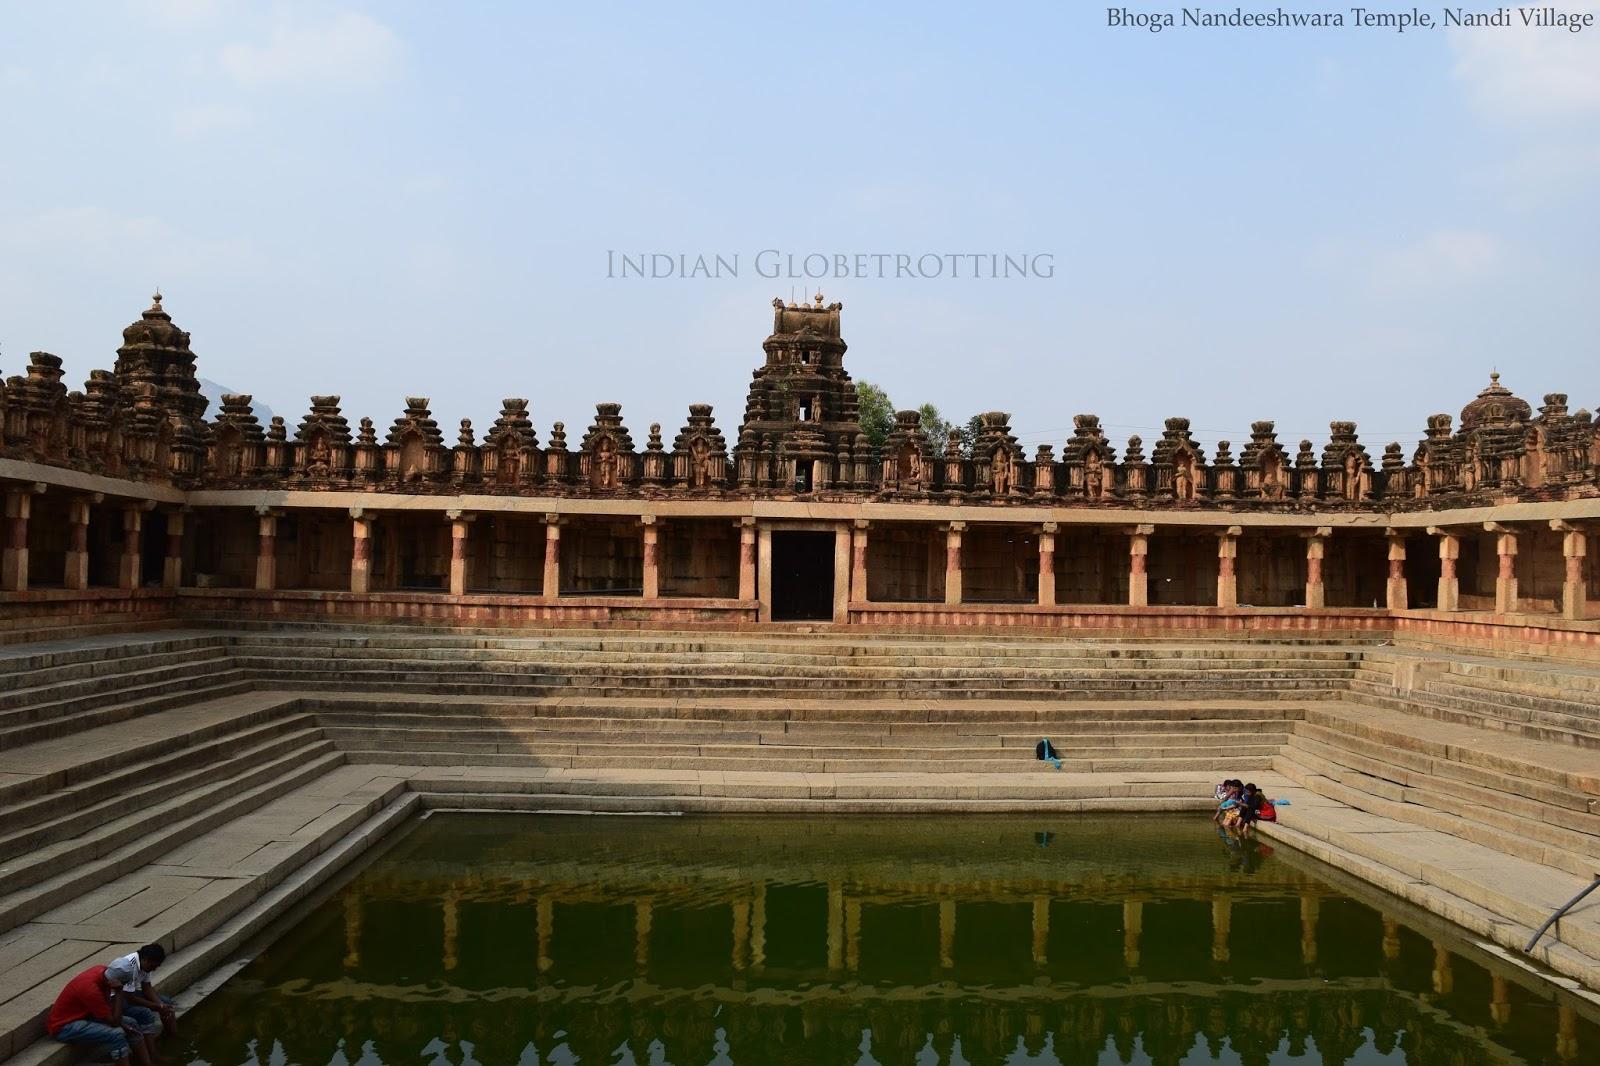 Pushkarani of Bhoga Nandeeshwara Temple in nandi village in karnataka